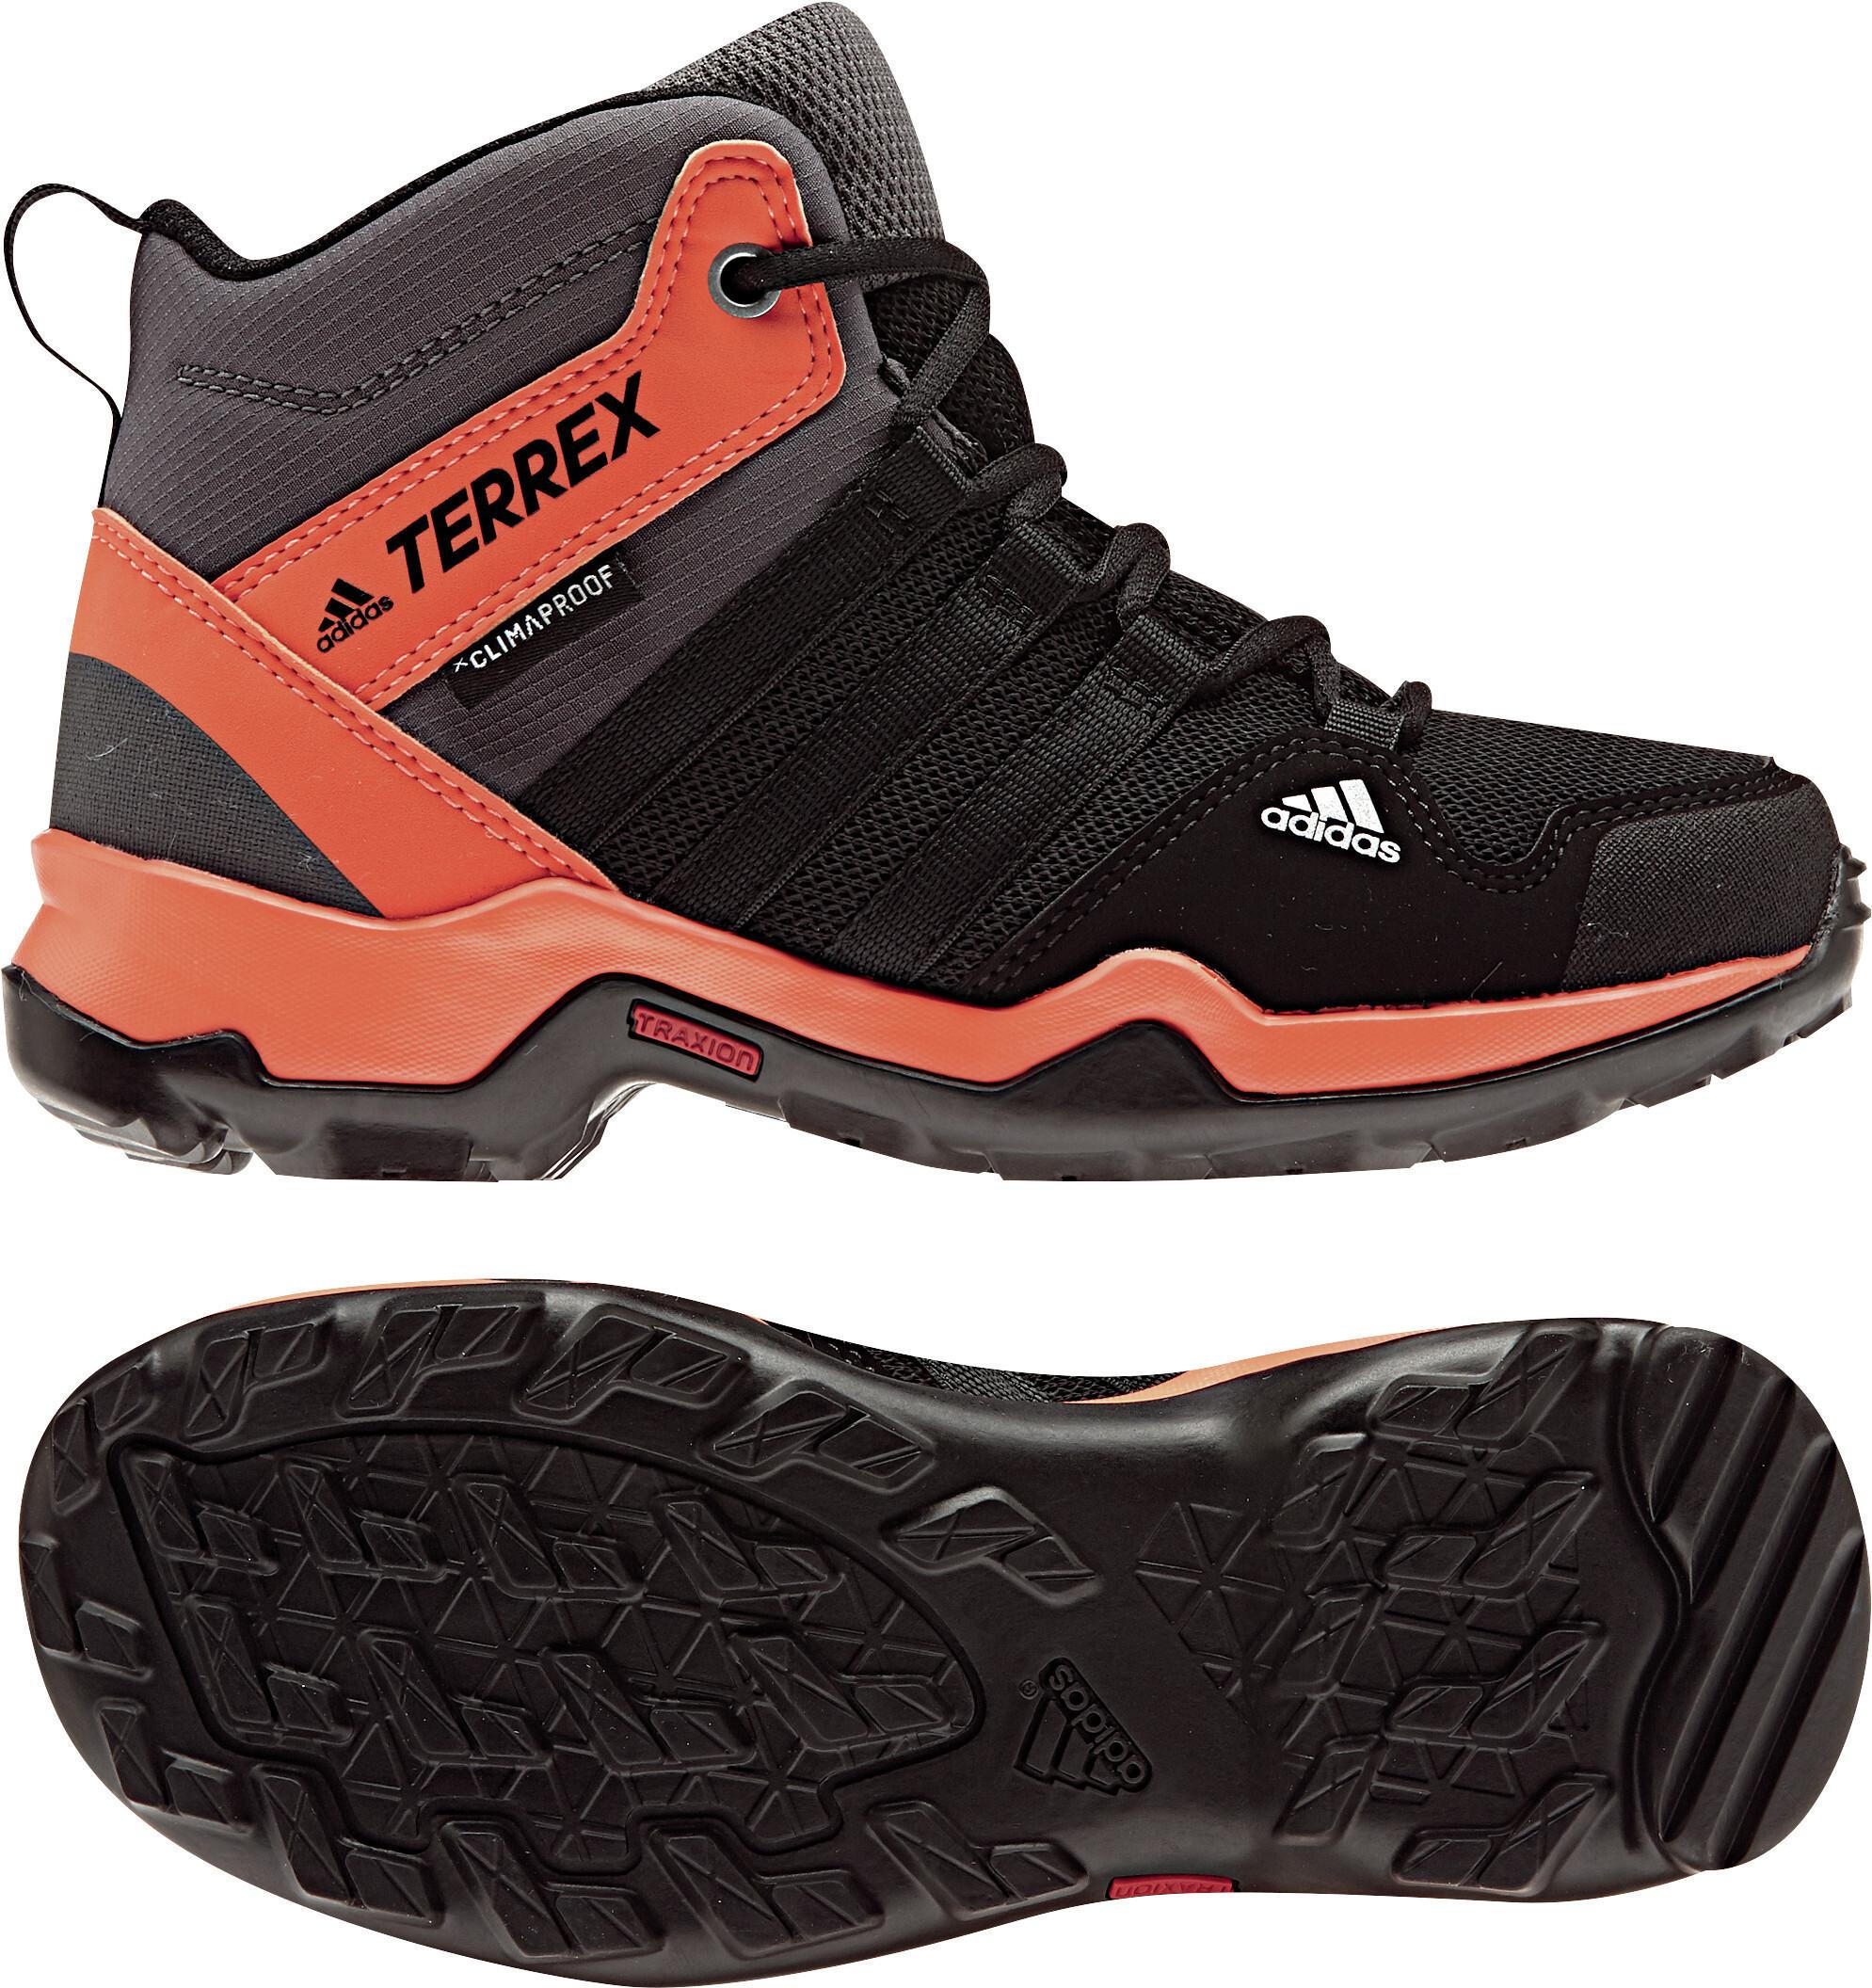 promo code 65ab5 30dc7 adidas TERREX AX2R ClimaProof Scarpe Bambino arancione nero